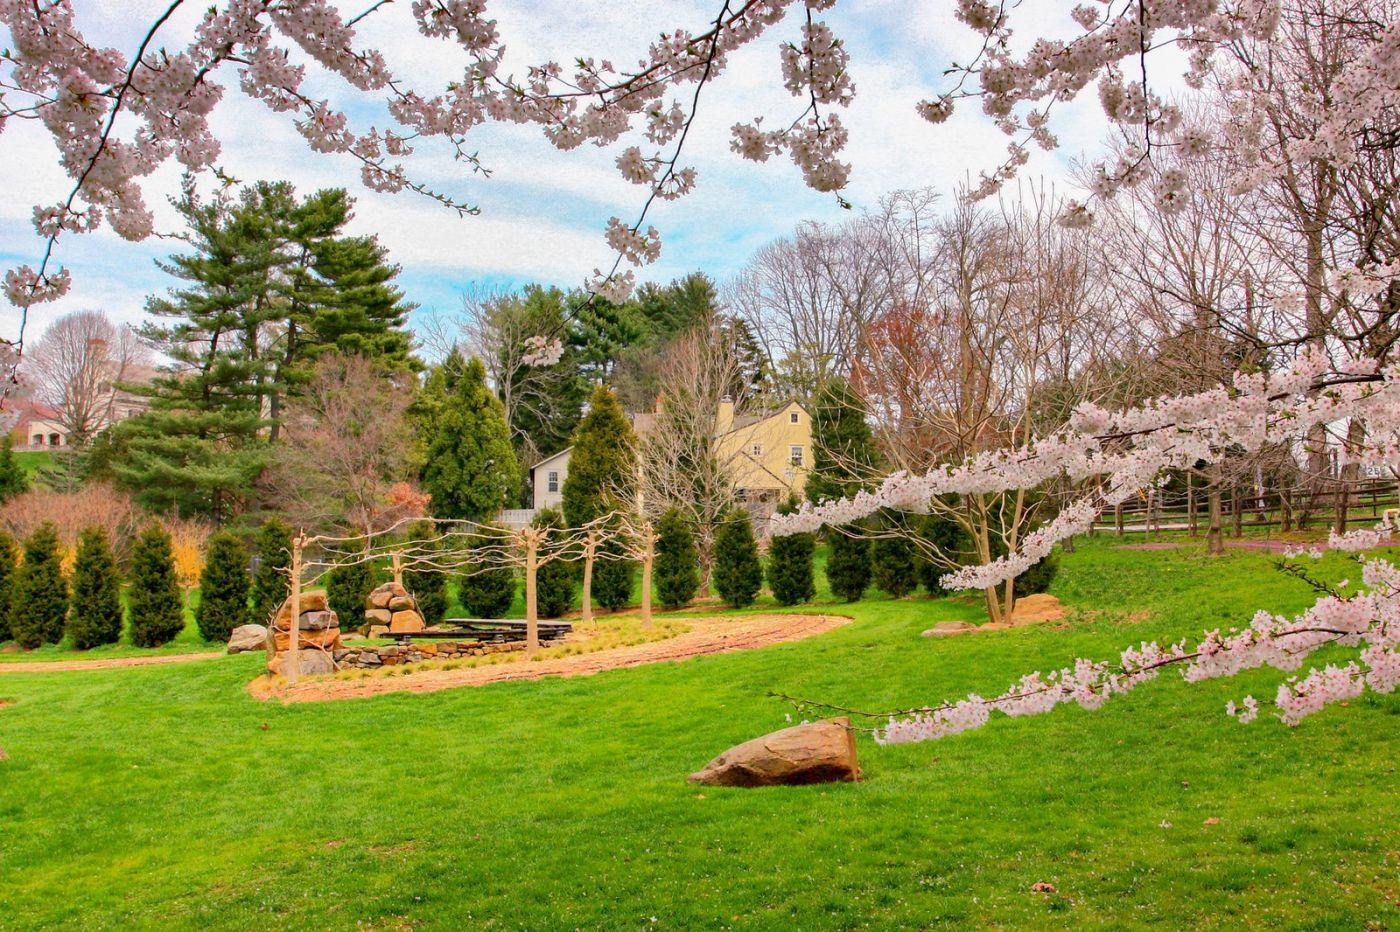 Chanticleer花园,春风得意_图1-24